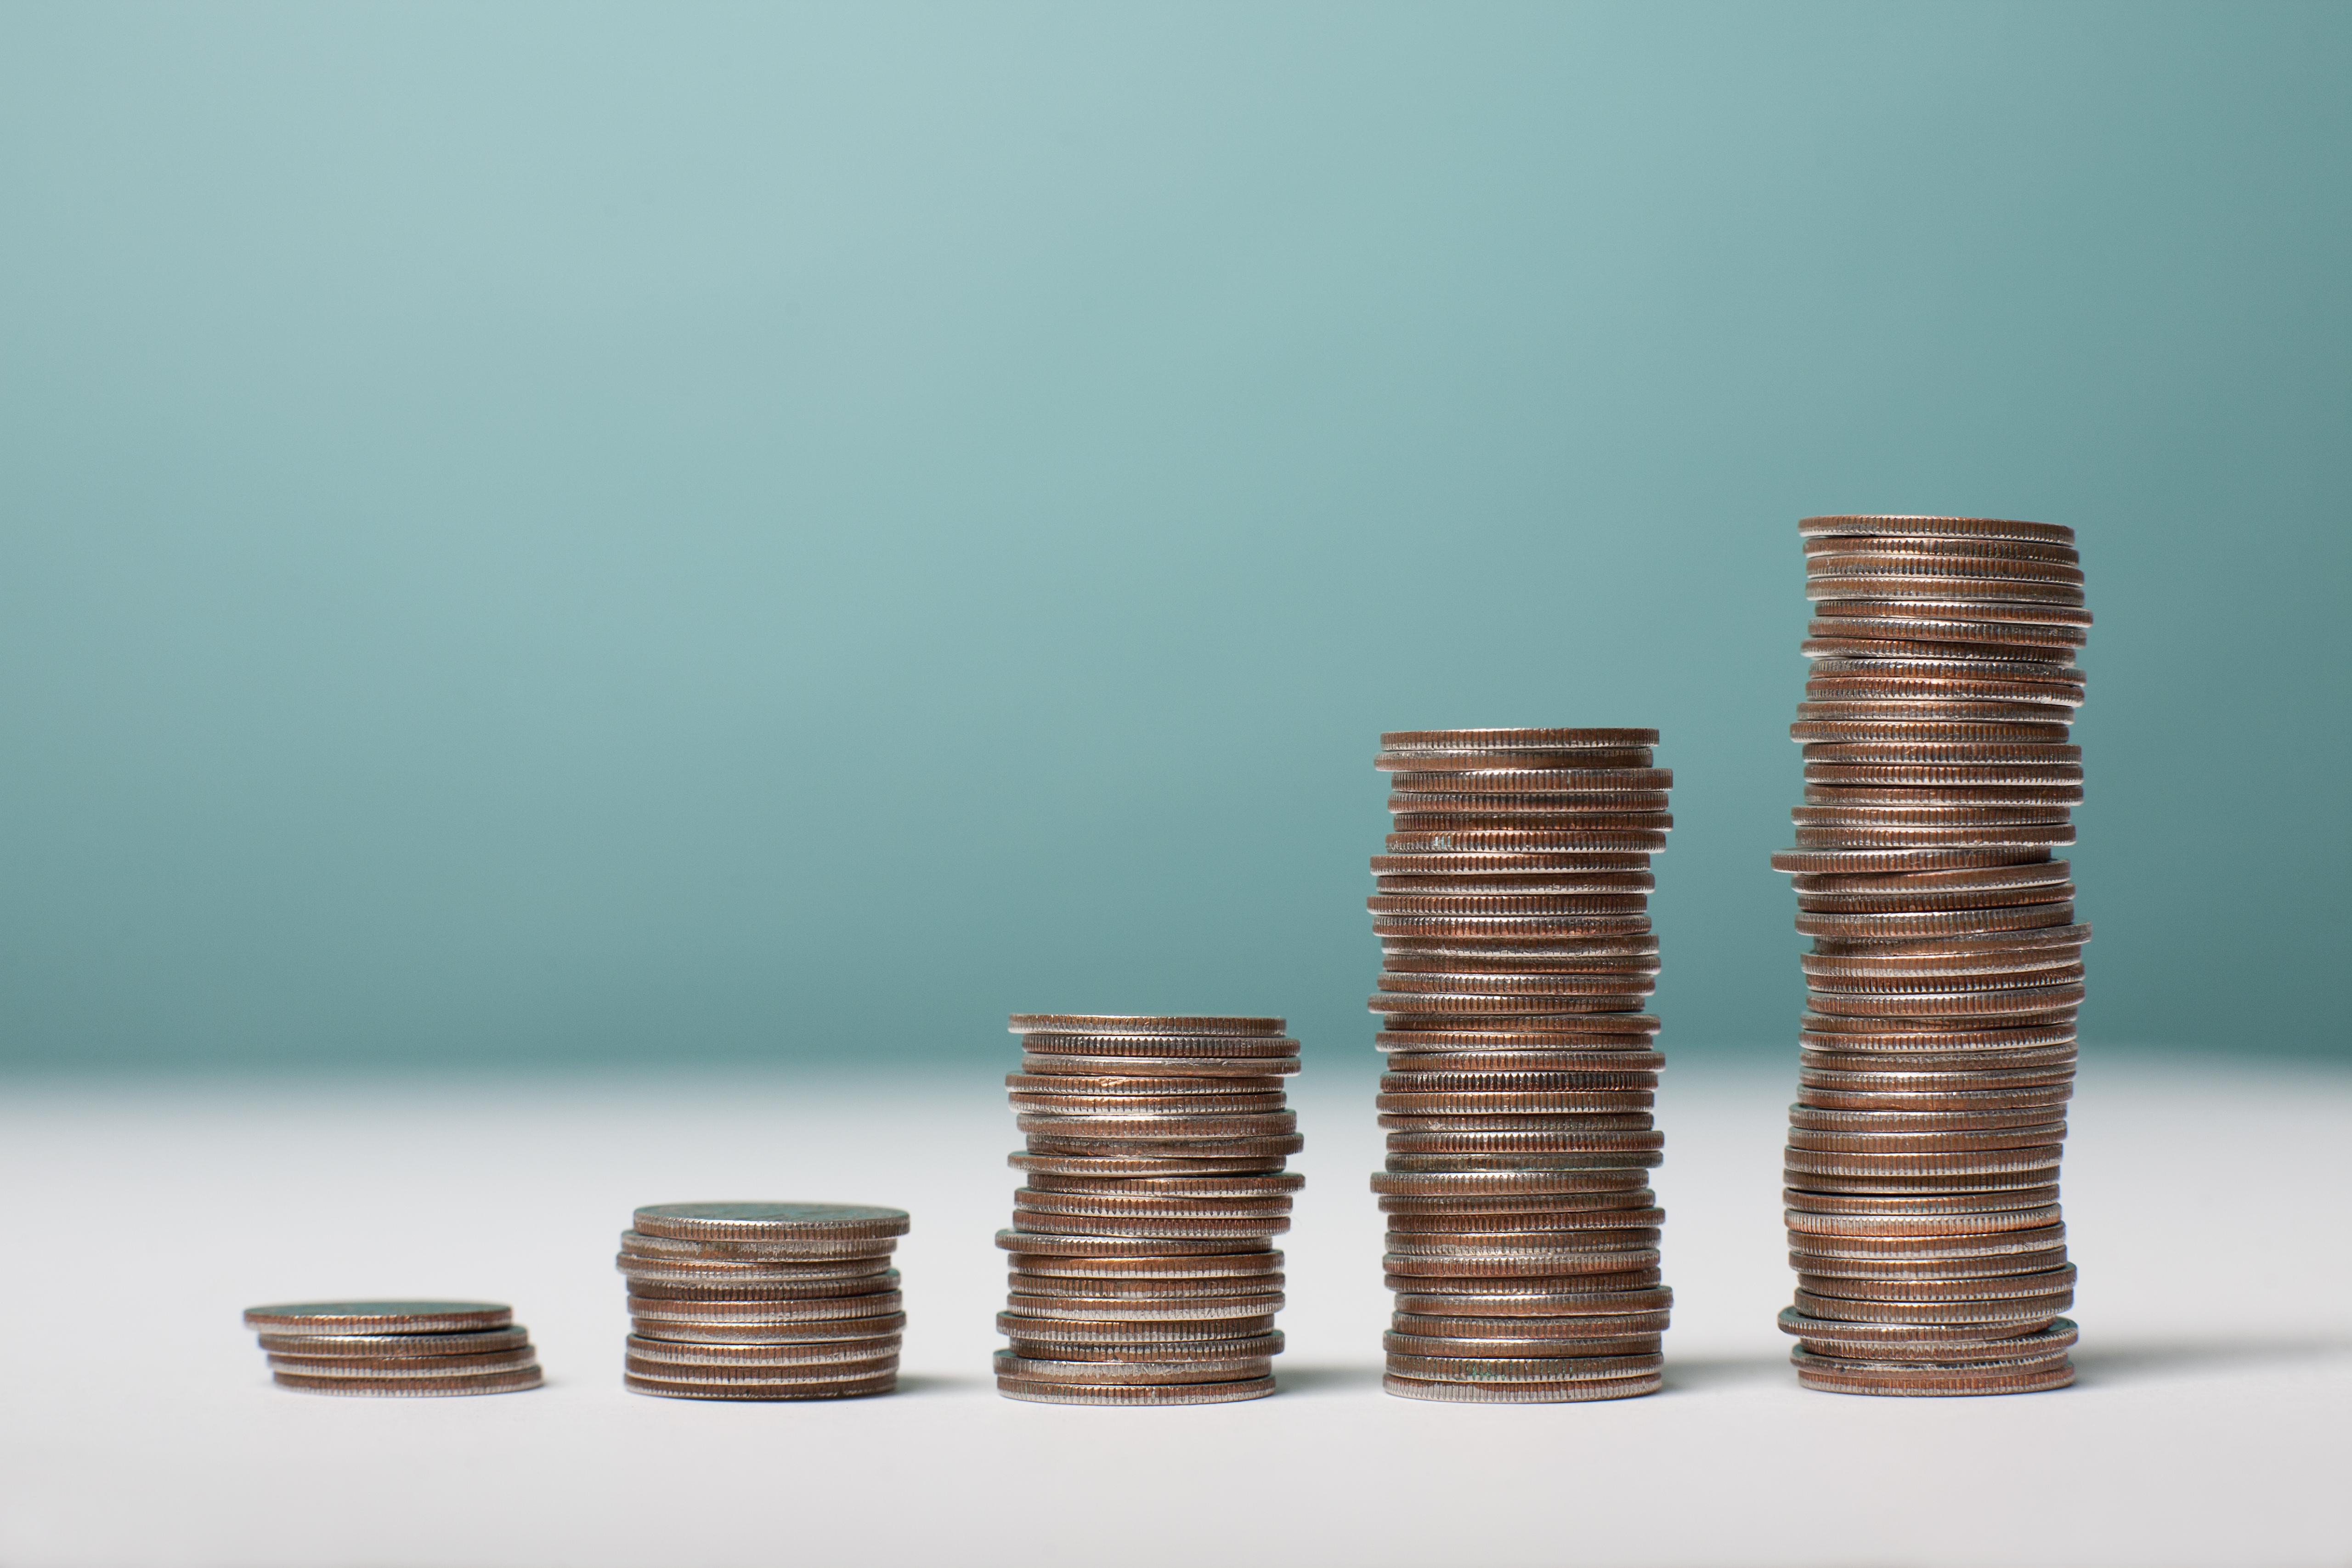 Studio shot of stacks of coins